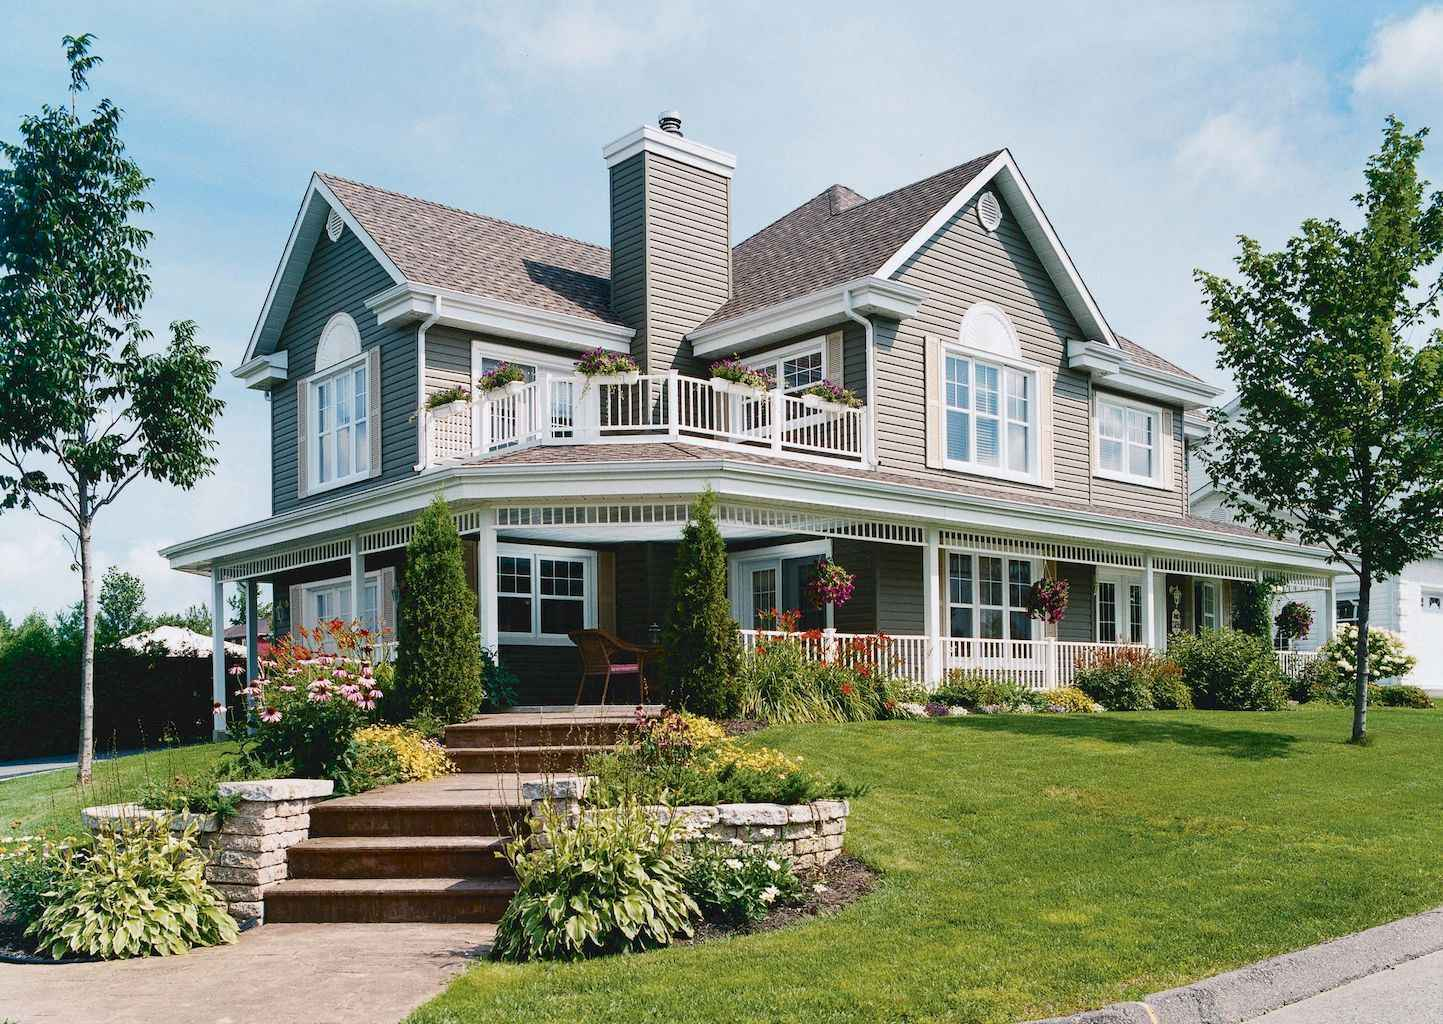 80 awesome victorian farmhouse plans design ideas (18)